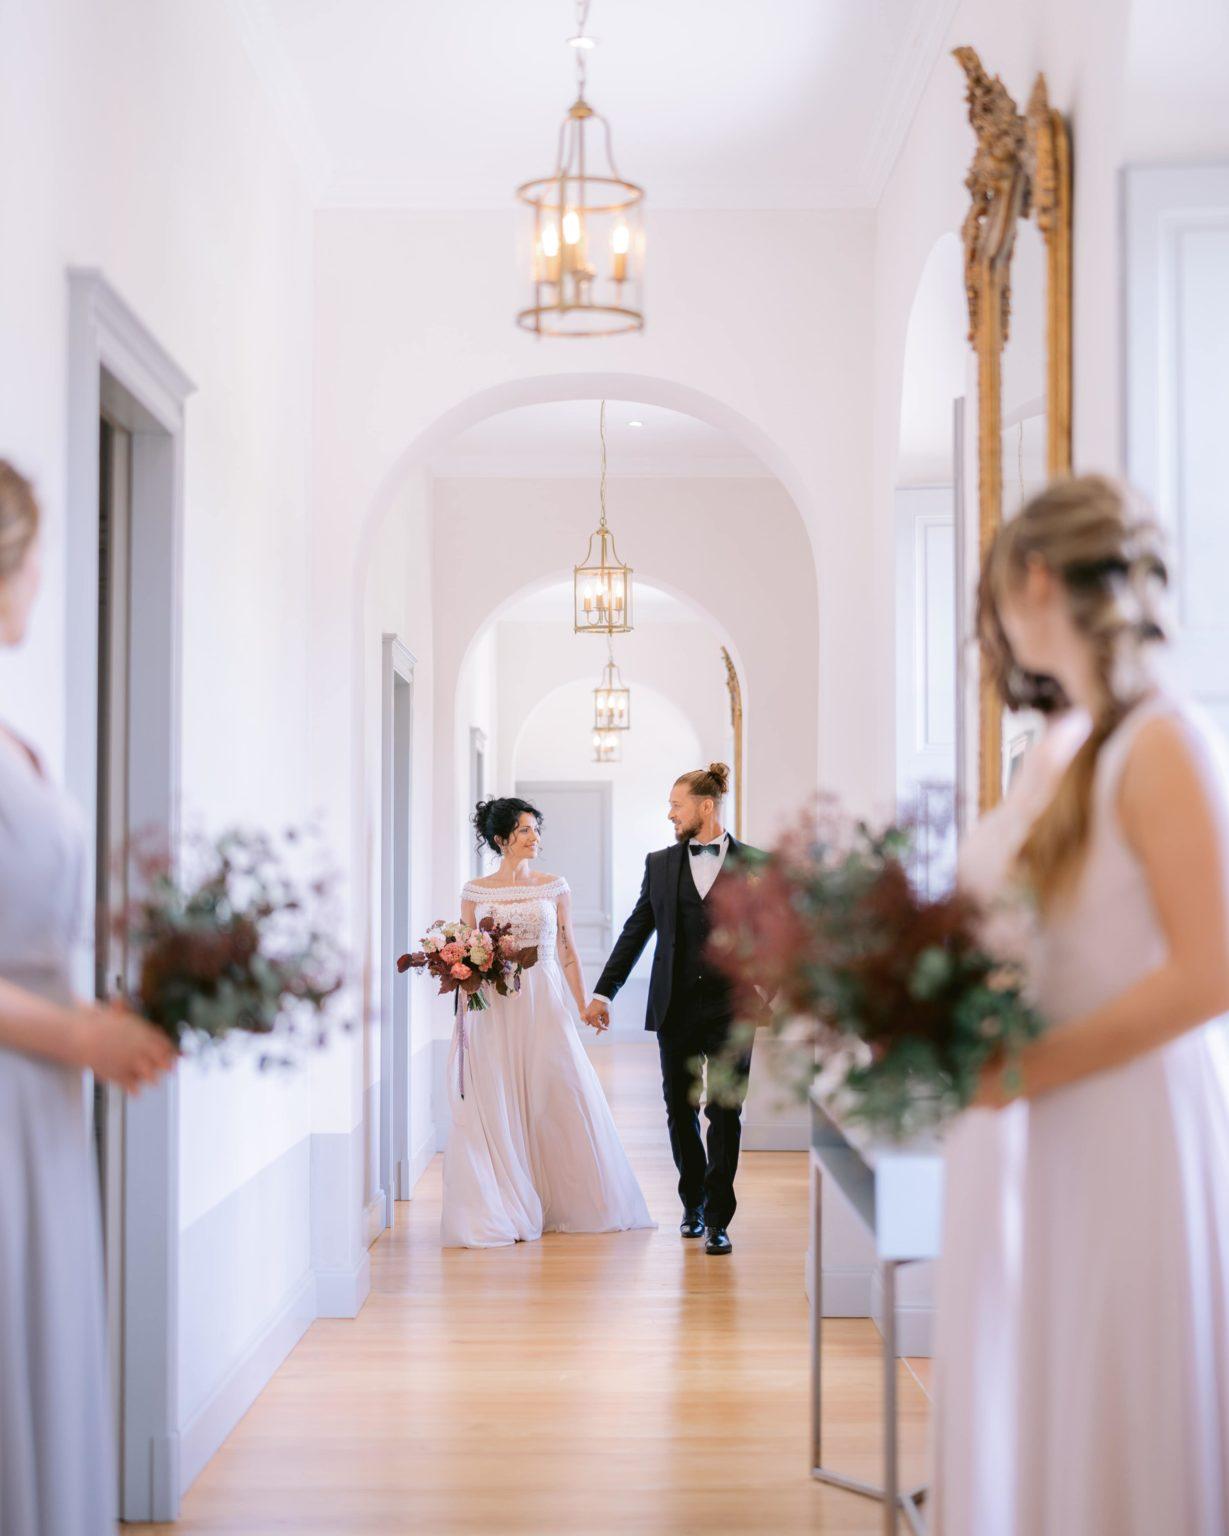 Photographe mariage Chateau de l'Hospital Gironde (43)